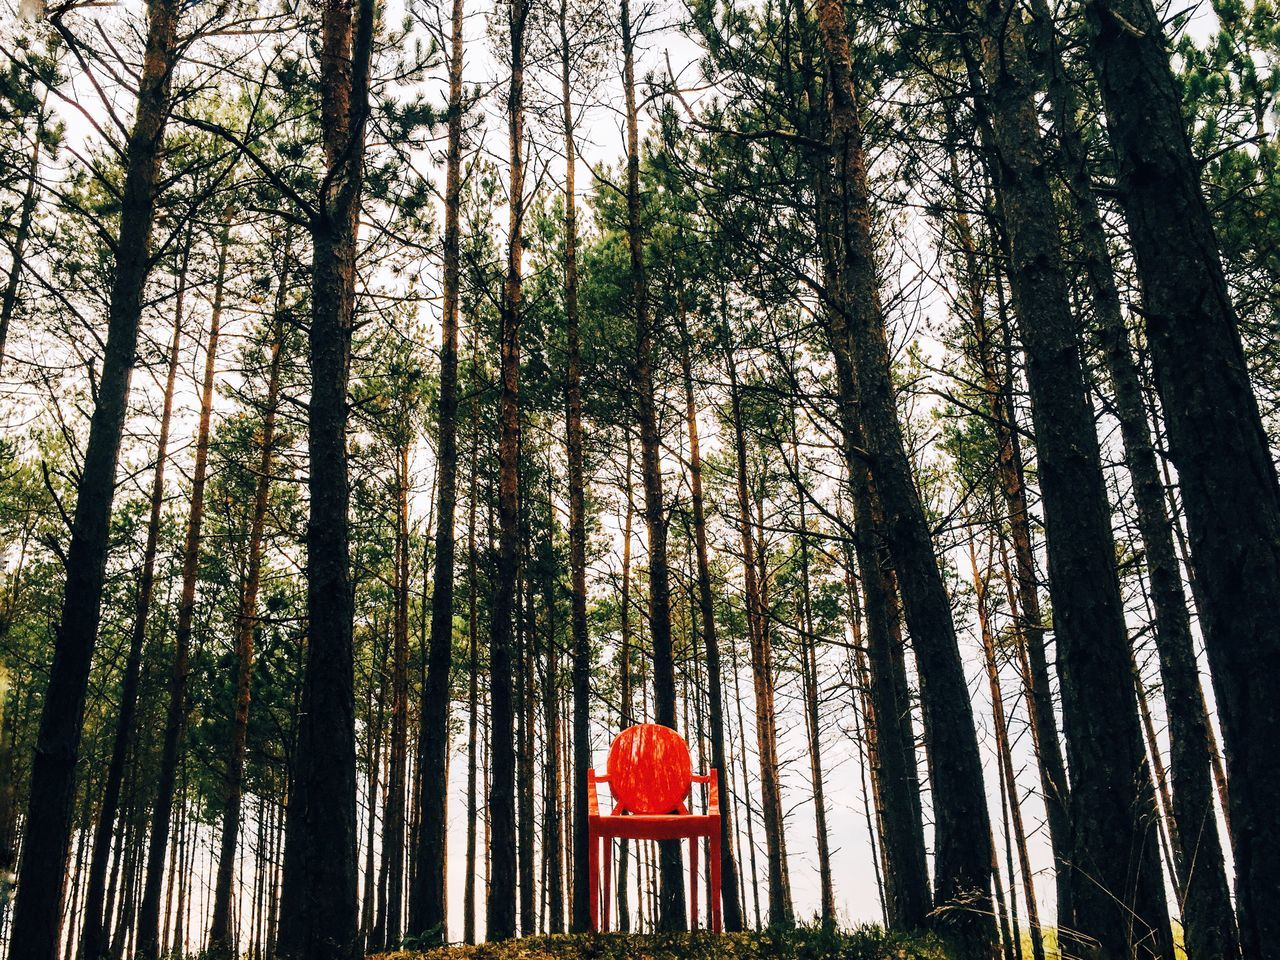 Chair Forest Trees TreePorn Landscape EyeEm Best Shots - Landscape Nature EyeEm Best Shots - Nature EyeEm Nature Lover IPSScenery